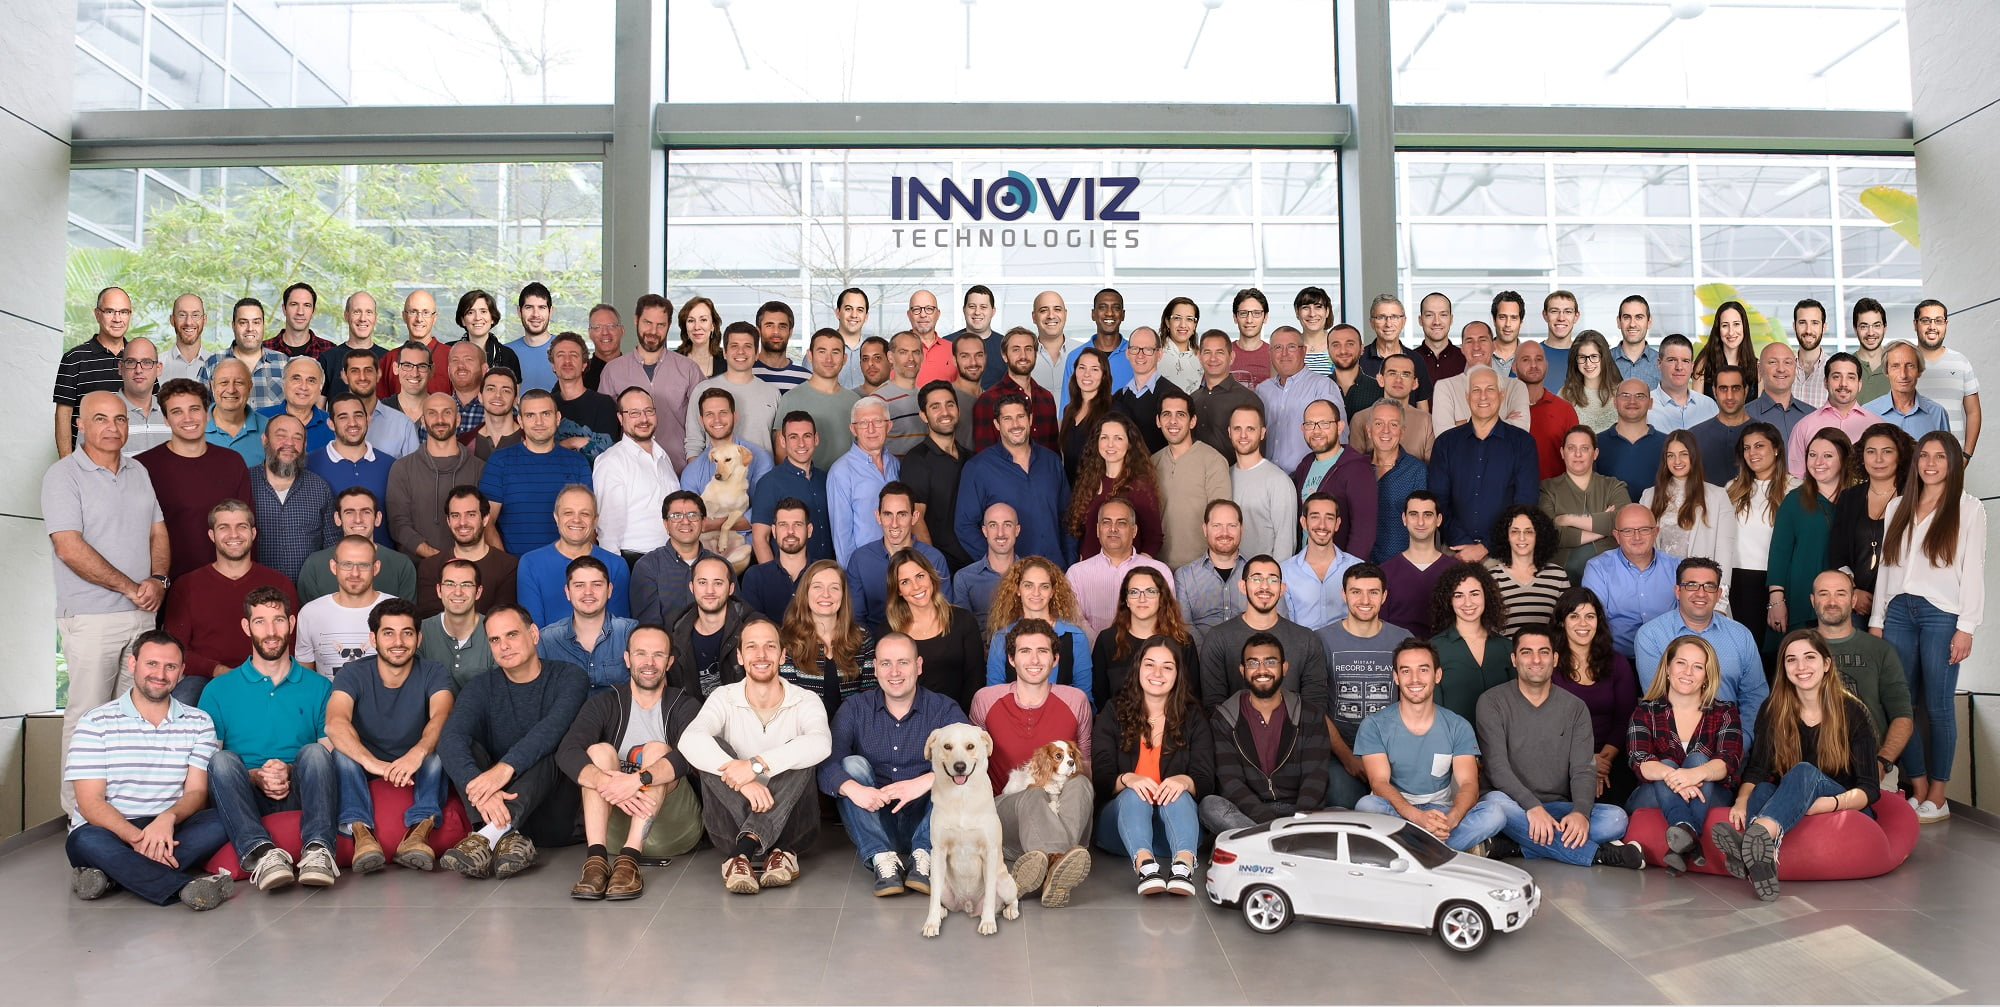 The Innoviz Technologies team made up of 150 employees. Courtesy.